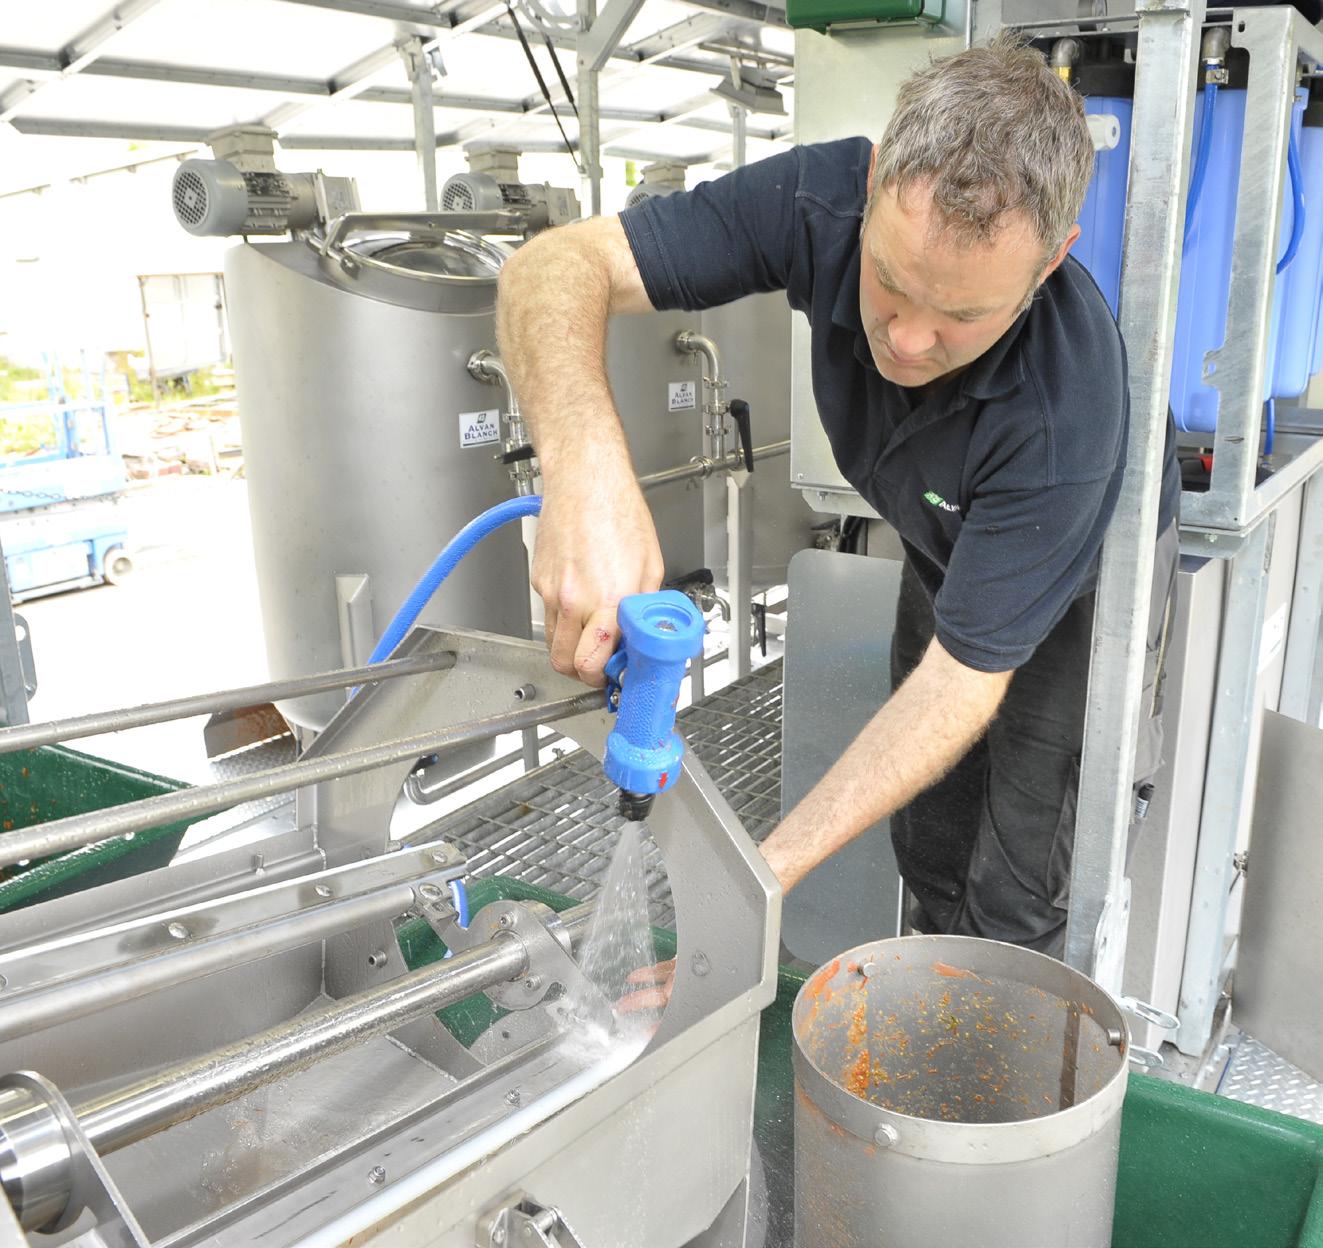 Alvan Blanch Mobile Fruit Juice Processing System Nigeria Page 2 Image 0005